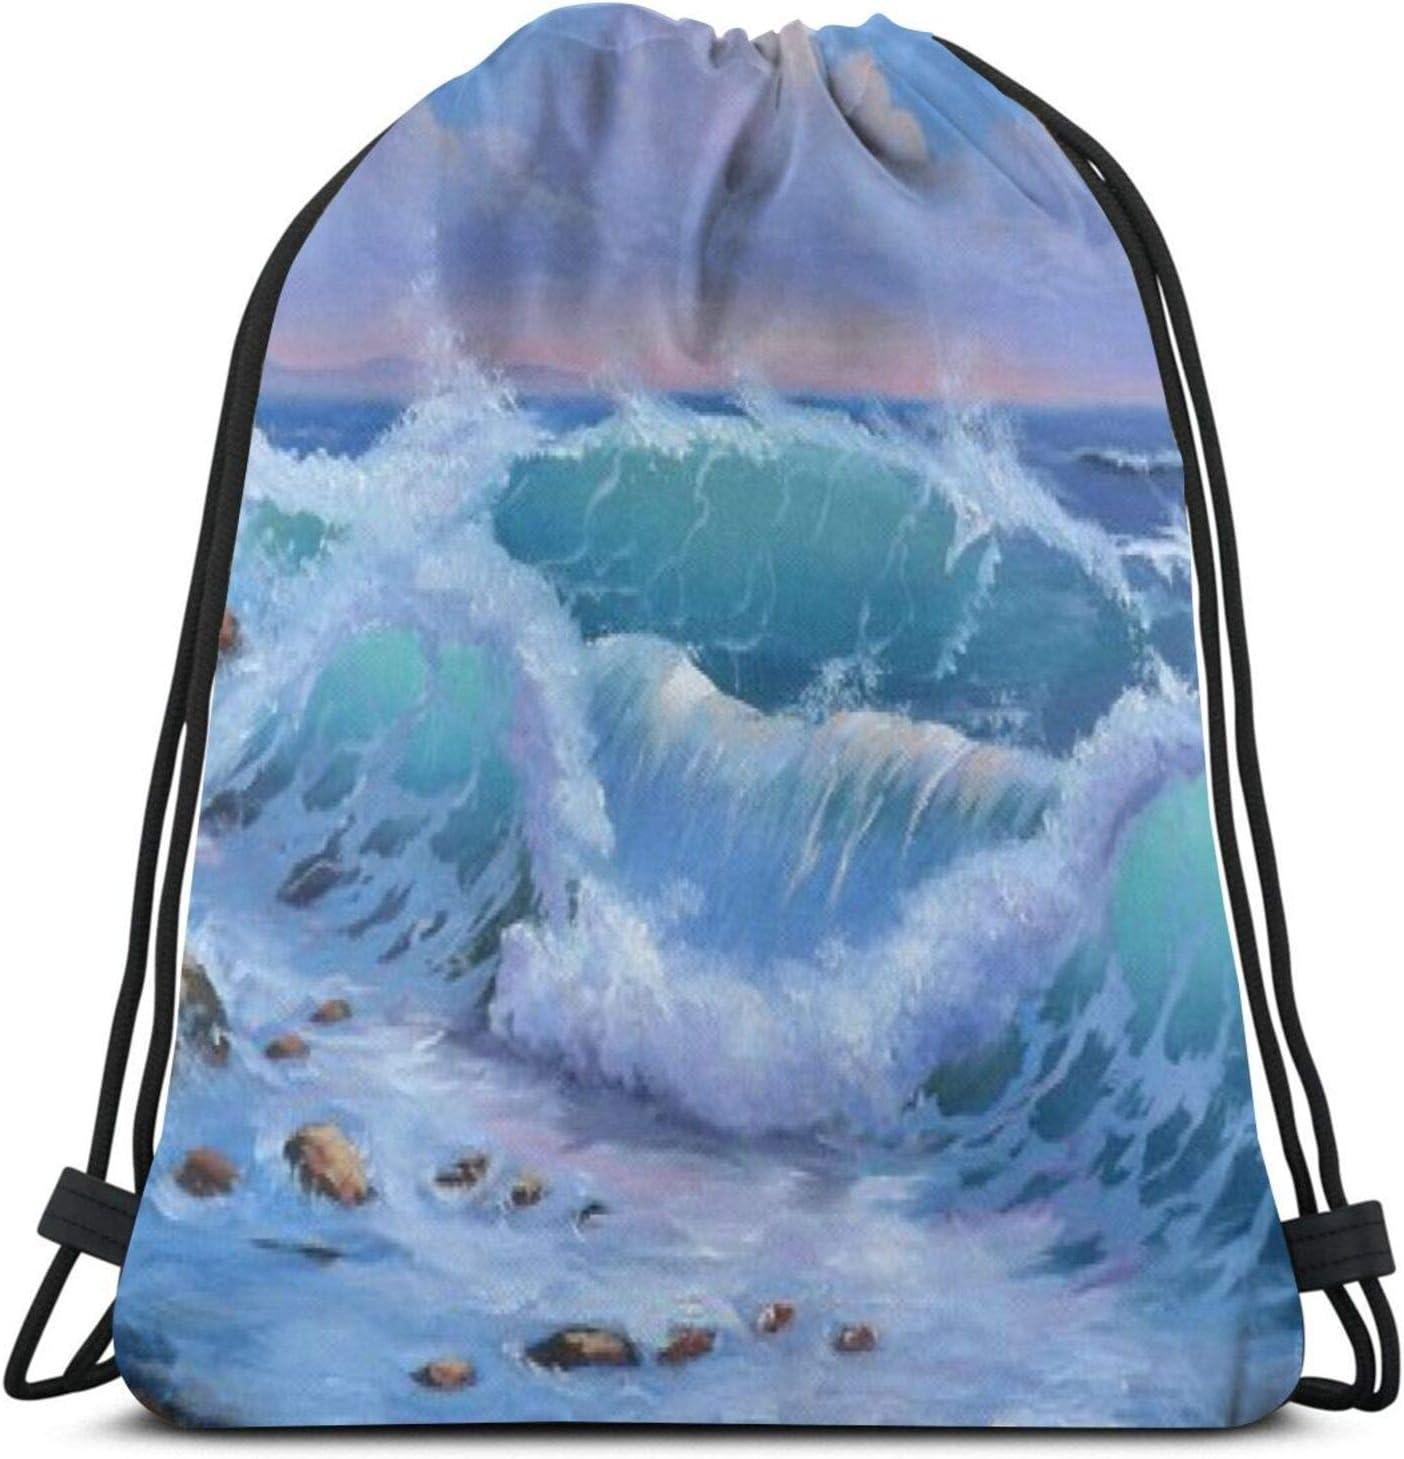 Aizawa Blue Wave Sea Ocean Watercolor Art Drawstring Bag Sport Gym Backpacks Storage Goodie Cinch Bags